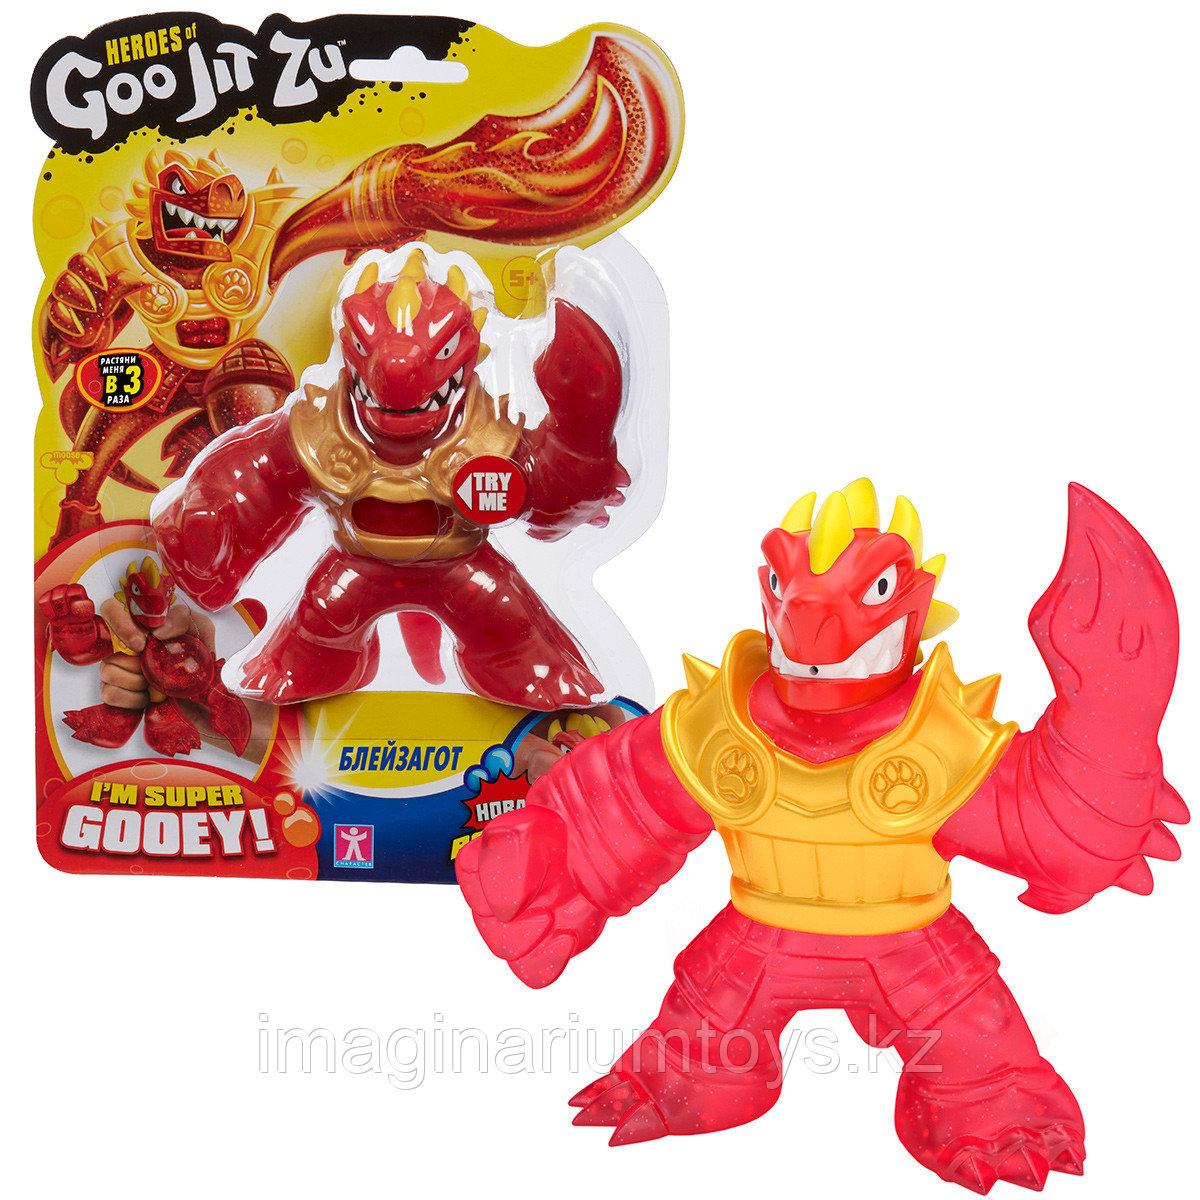 Гуджитсу Дракон Блейзагот Водная атака Goo Jit Zu